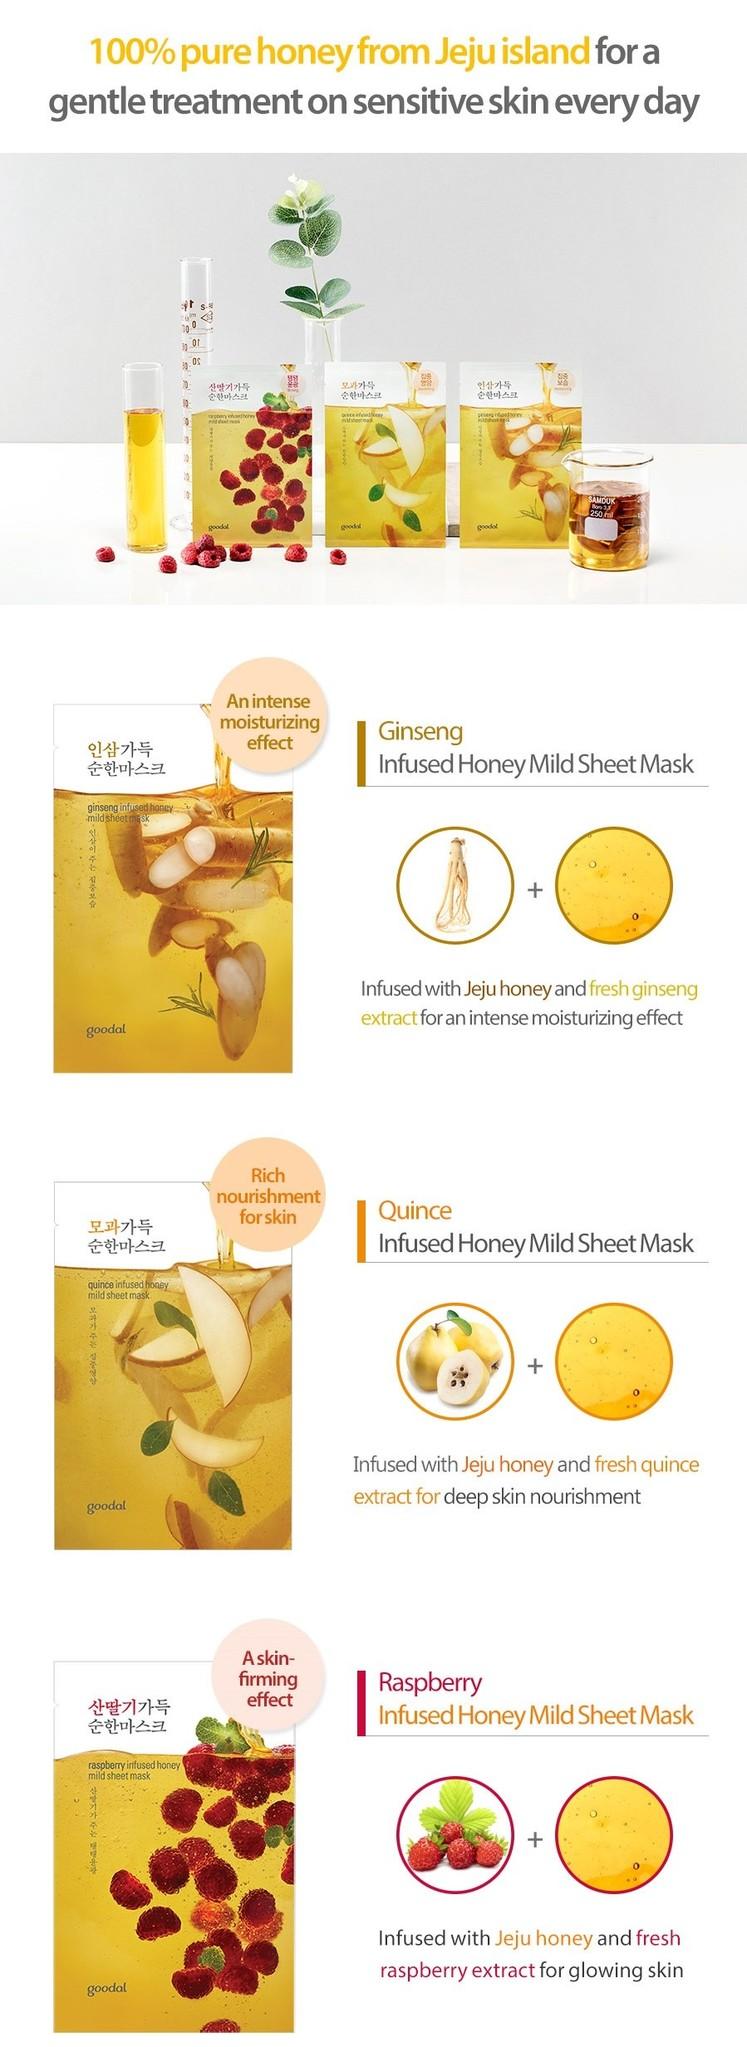 greentea infused water mild sheet mask-7